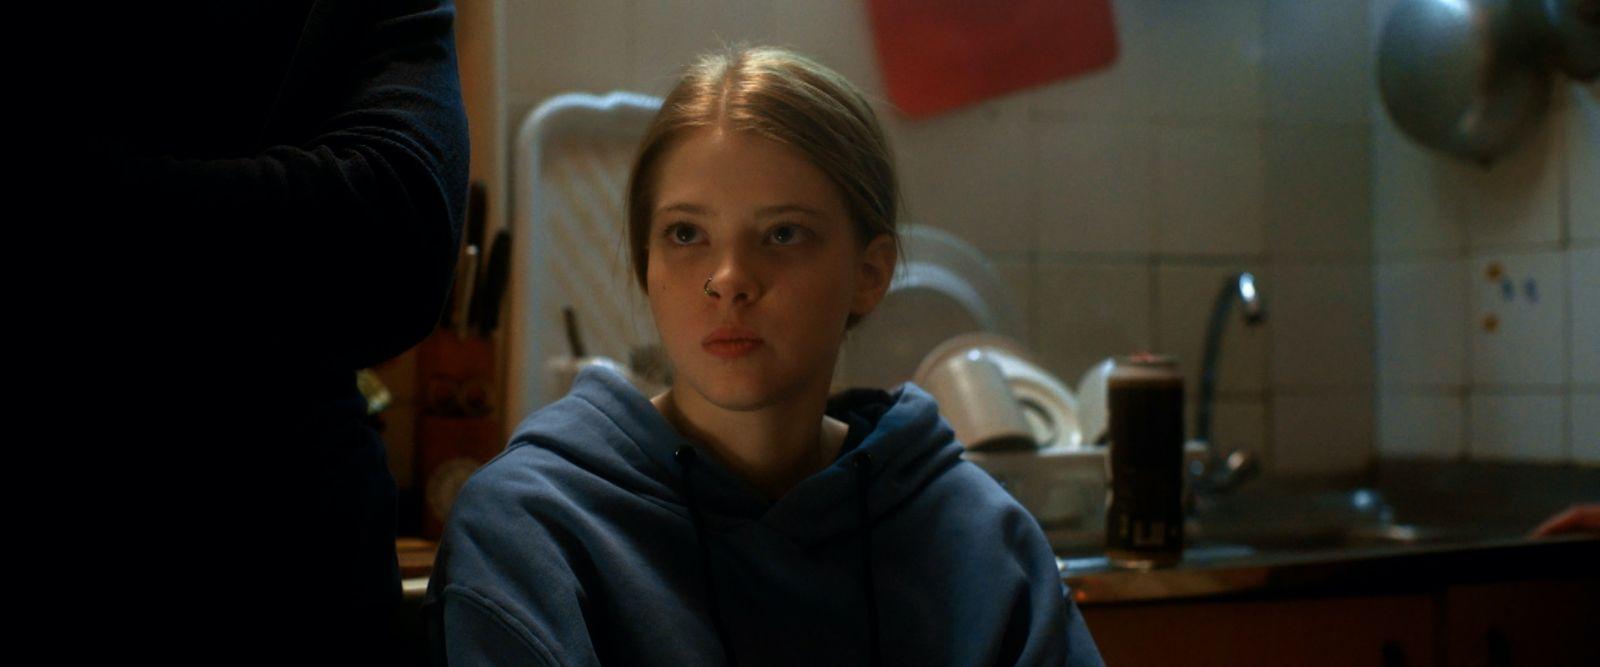 Валентина Лялина в роли Джулс на кадре из сериала «Подслушано»